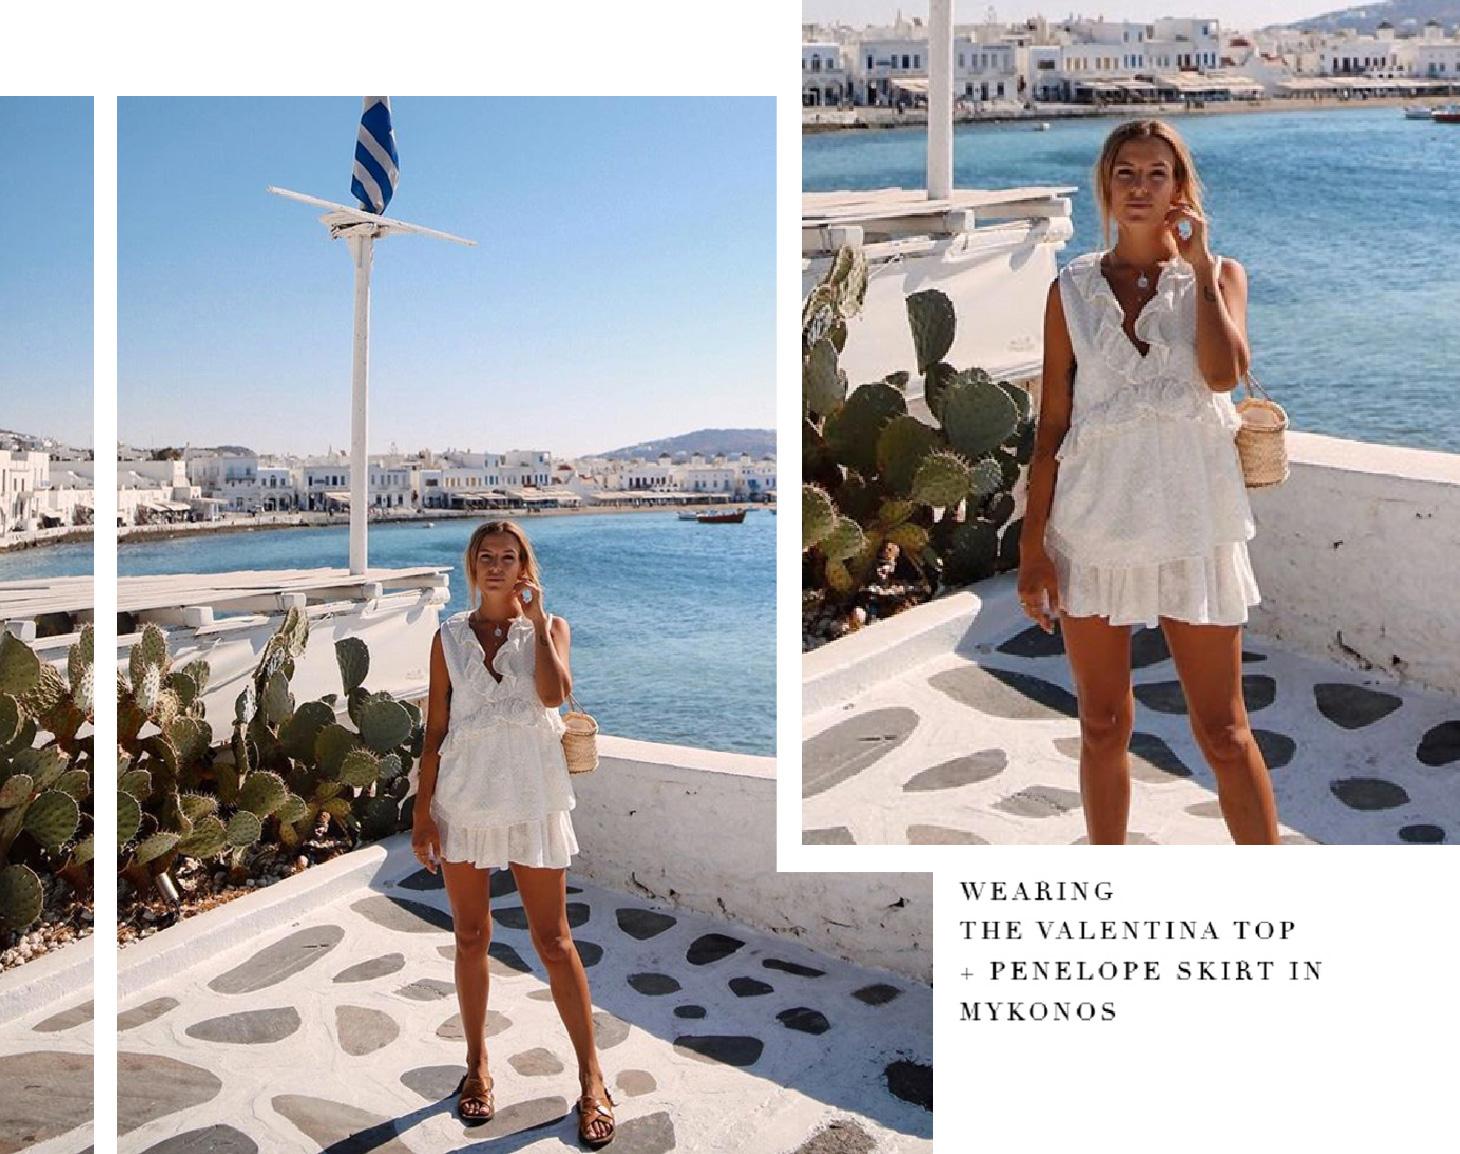 wearing-valentina-and-penelope-skirt.jpg